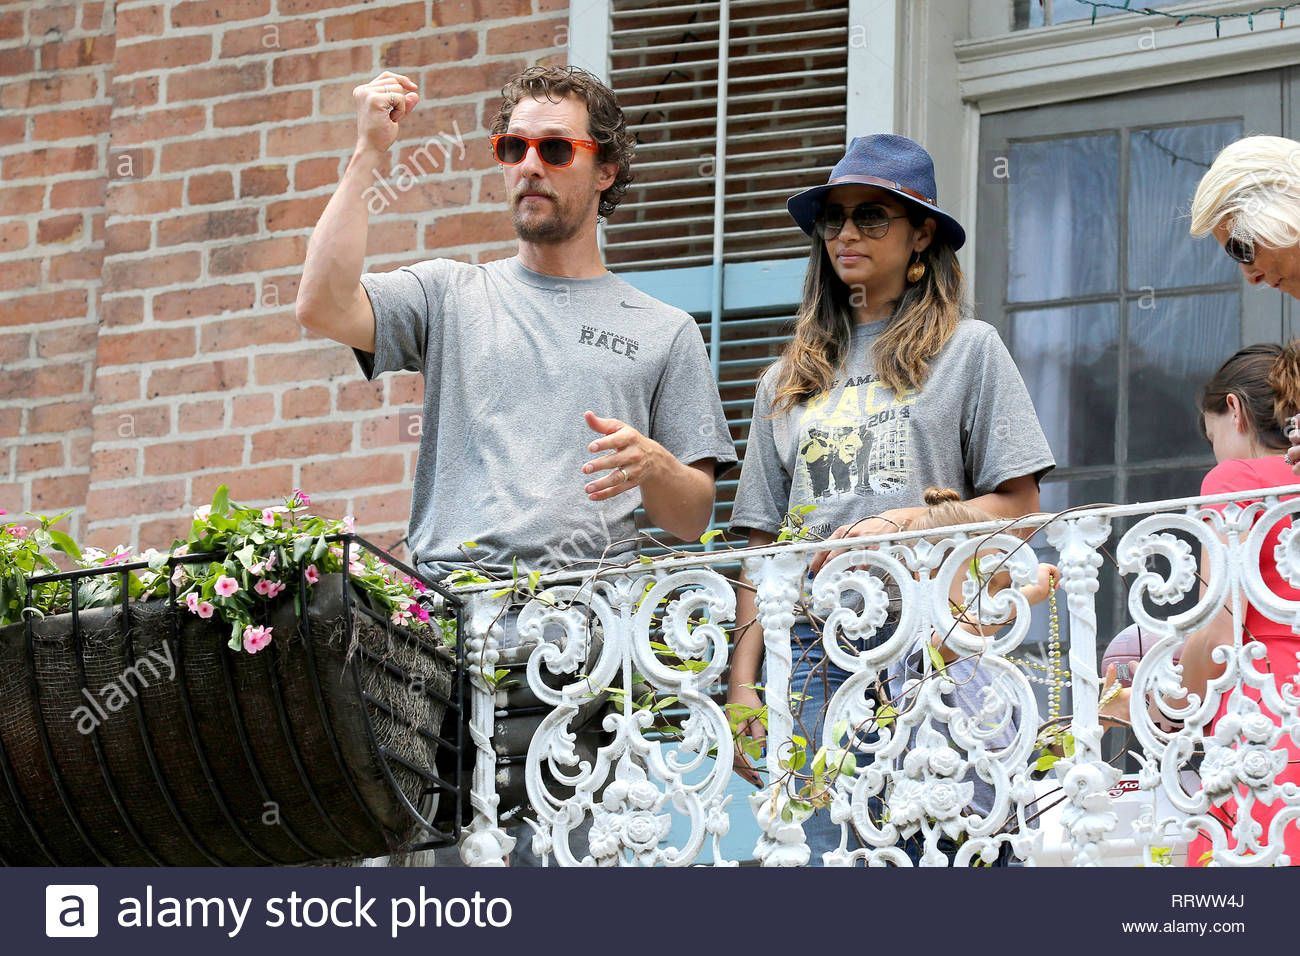 New Orleans La Brad Pitt And Matthew Mcconaughey Toss A Football